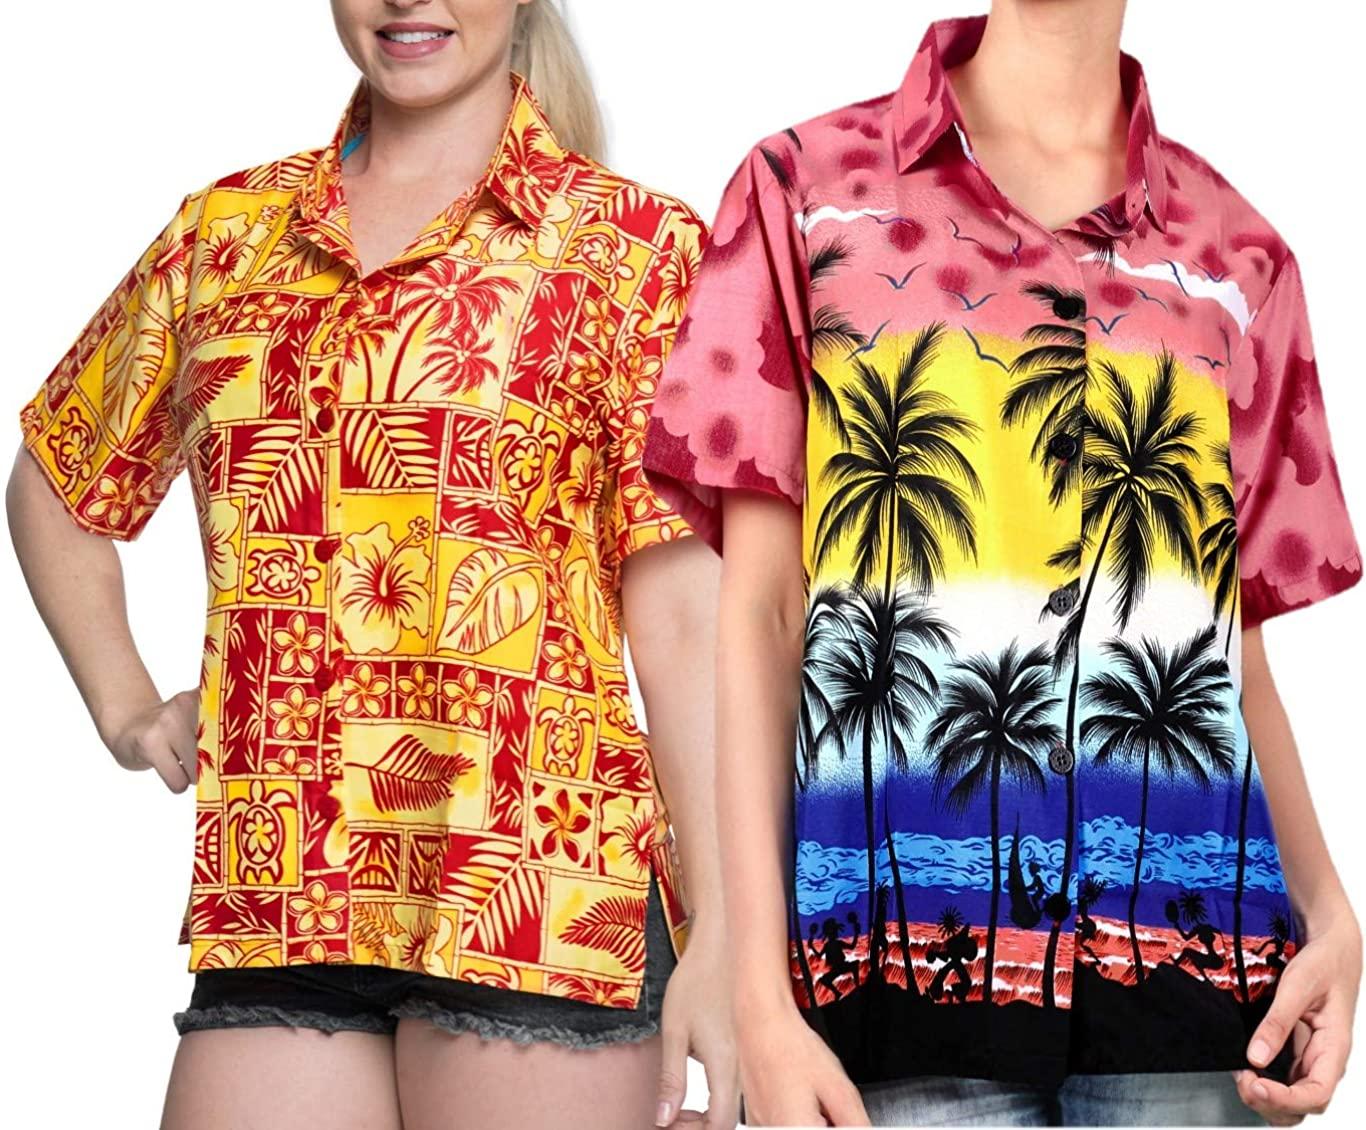 LA LEELA Women's Beach Hawaiian Shirt Dress Casual Button Down Shirts Work from Home Clothes Women Beach Shirt Blouse Shirt Combo Pack of 2 Size XL